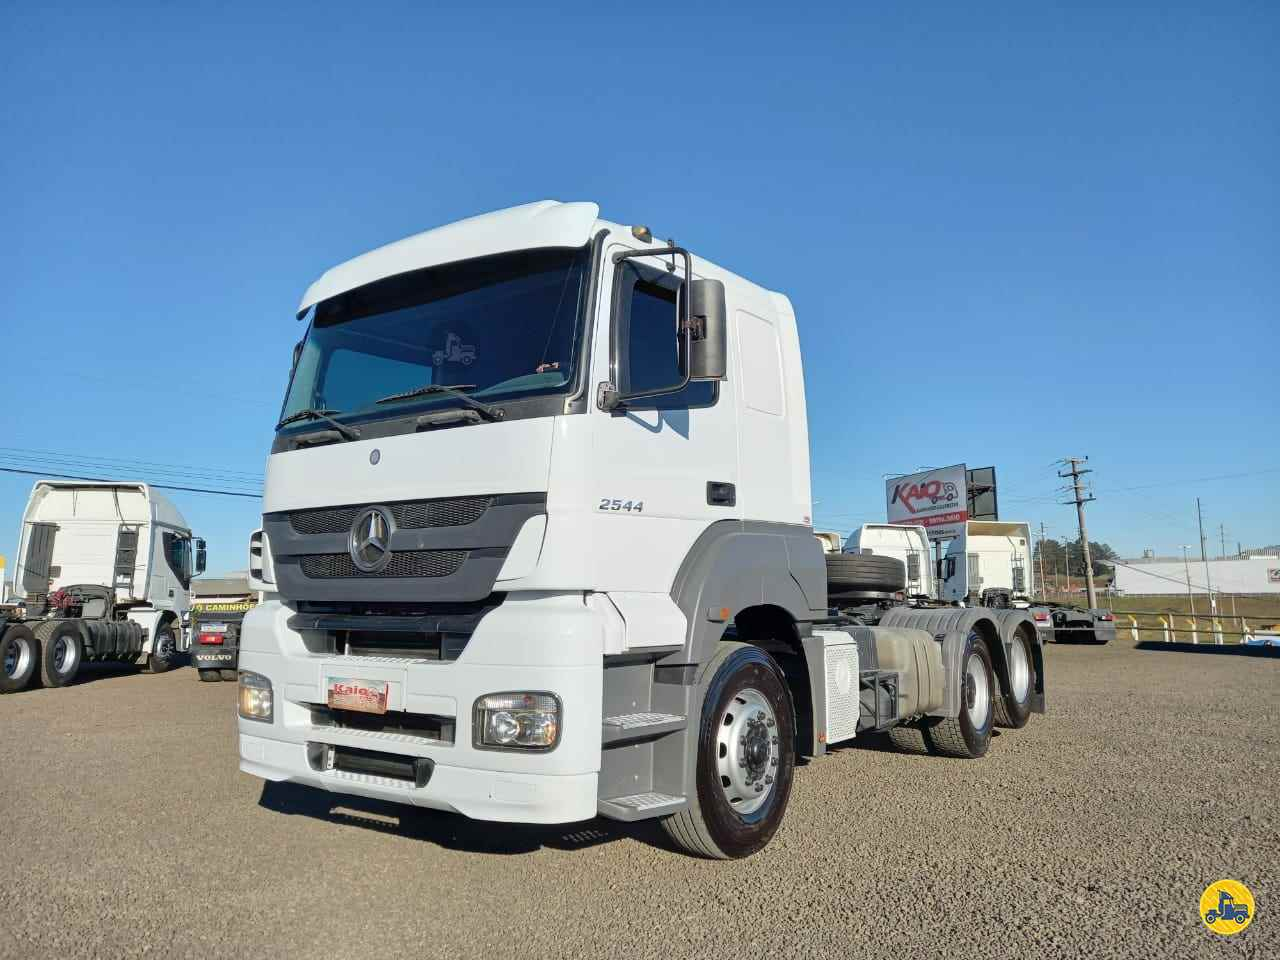 CAMINHAO MERCEDES-BENZ MB 2544 Chassis Truck 6x2 Kaio Caminhões LAGES SANTA CATARINA SC